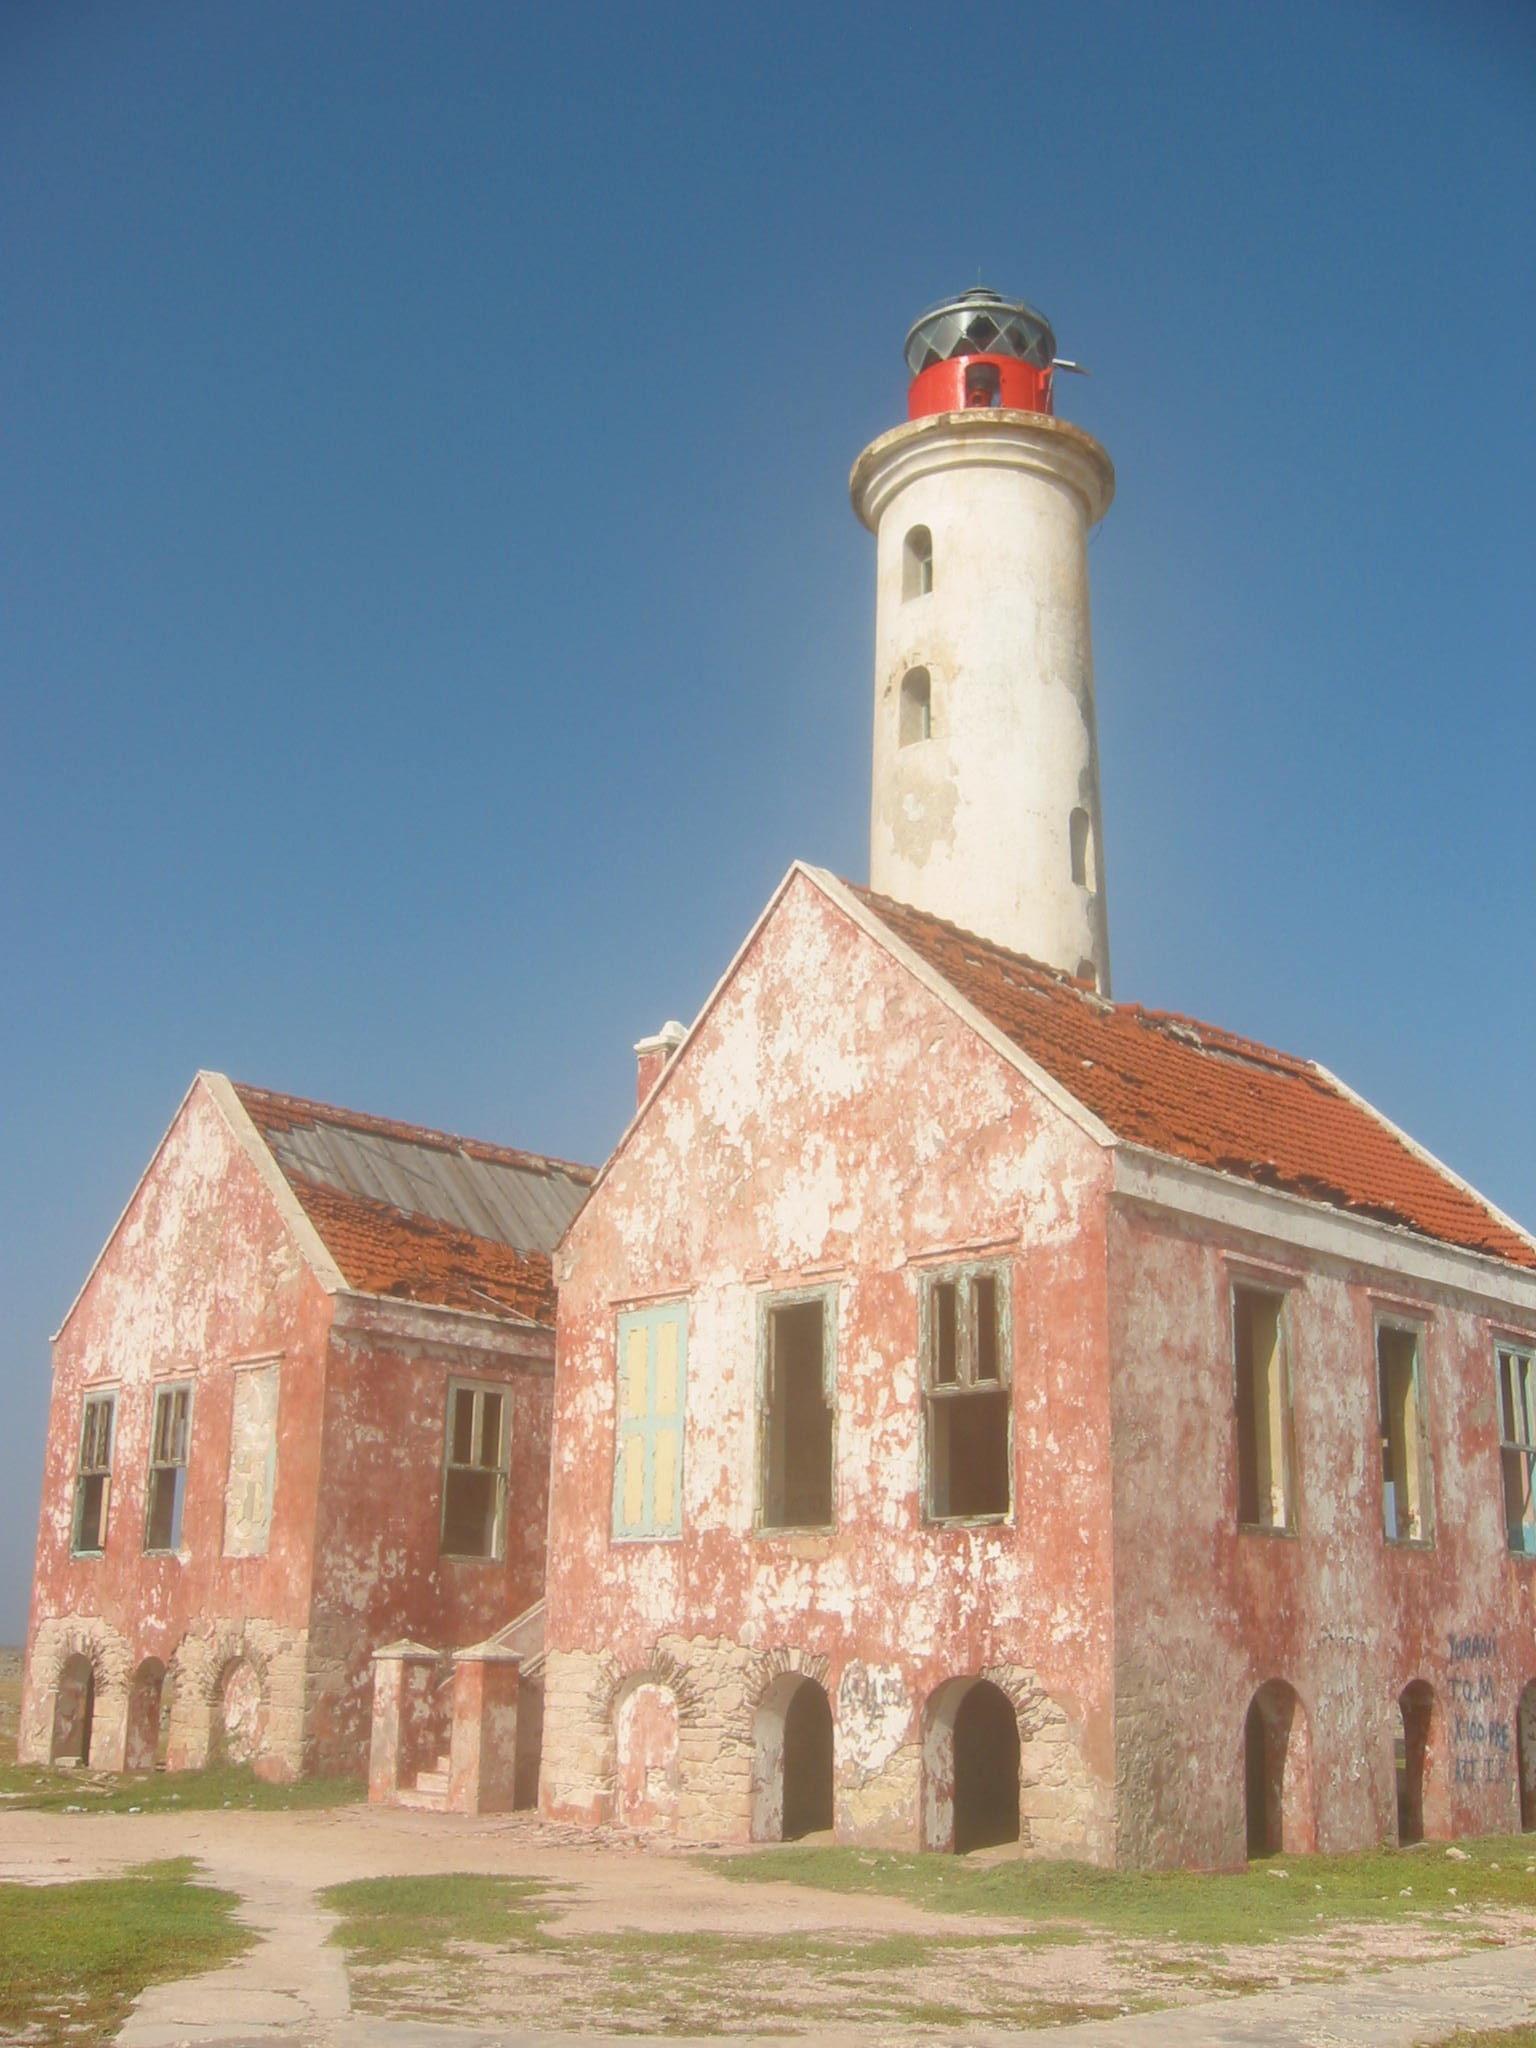 Klein Curacao Light, Bonaire